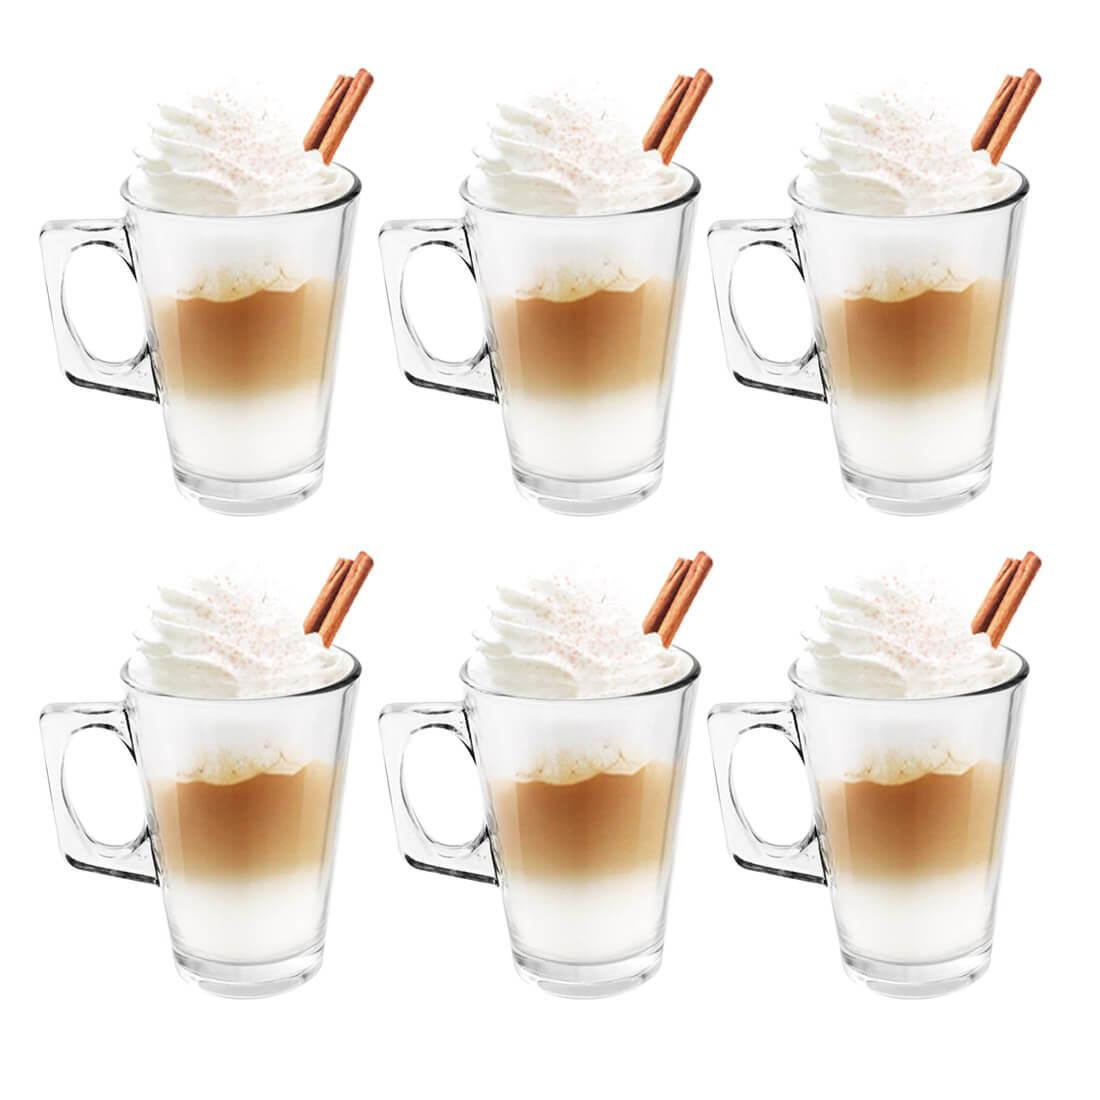 Jogo com 6 Xícaras 250ml Compativel Dolce Gusto Cappuccino